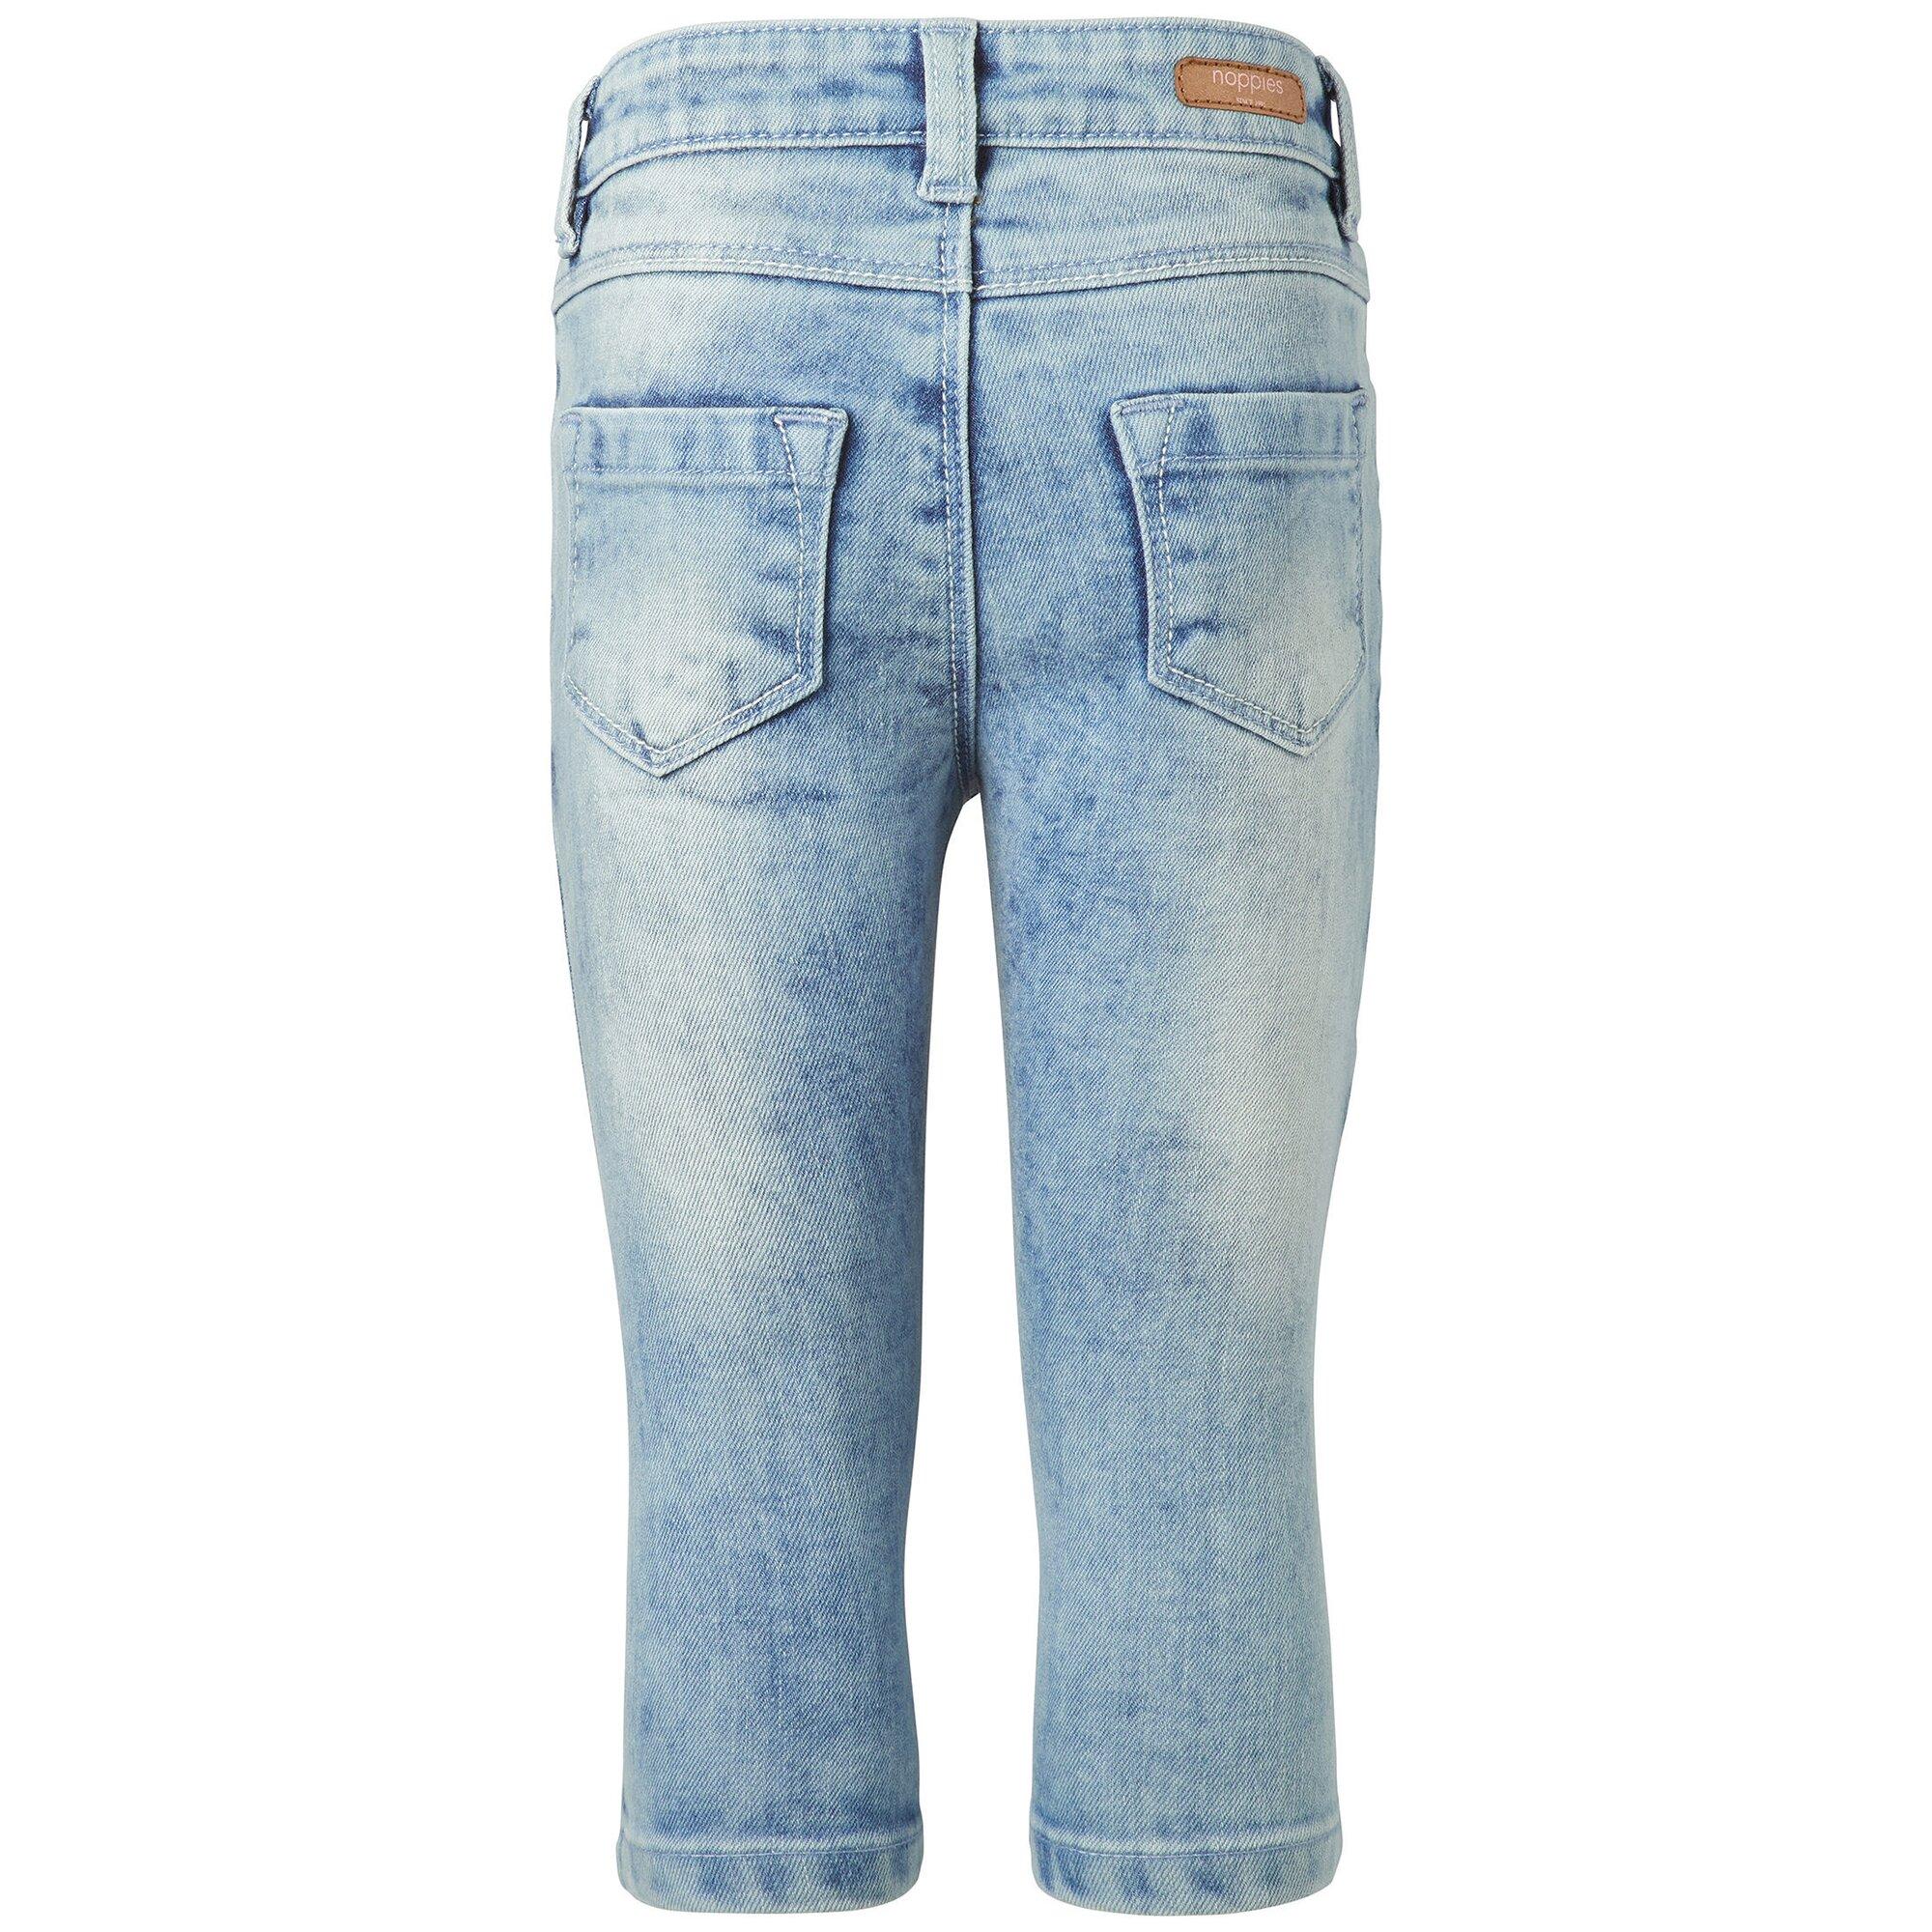 noppies-capri-jeans-mere